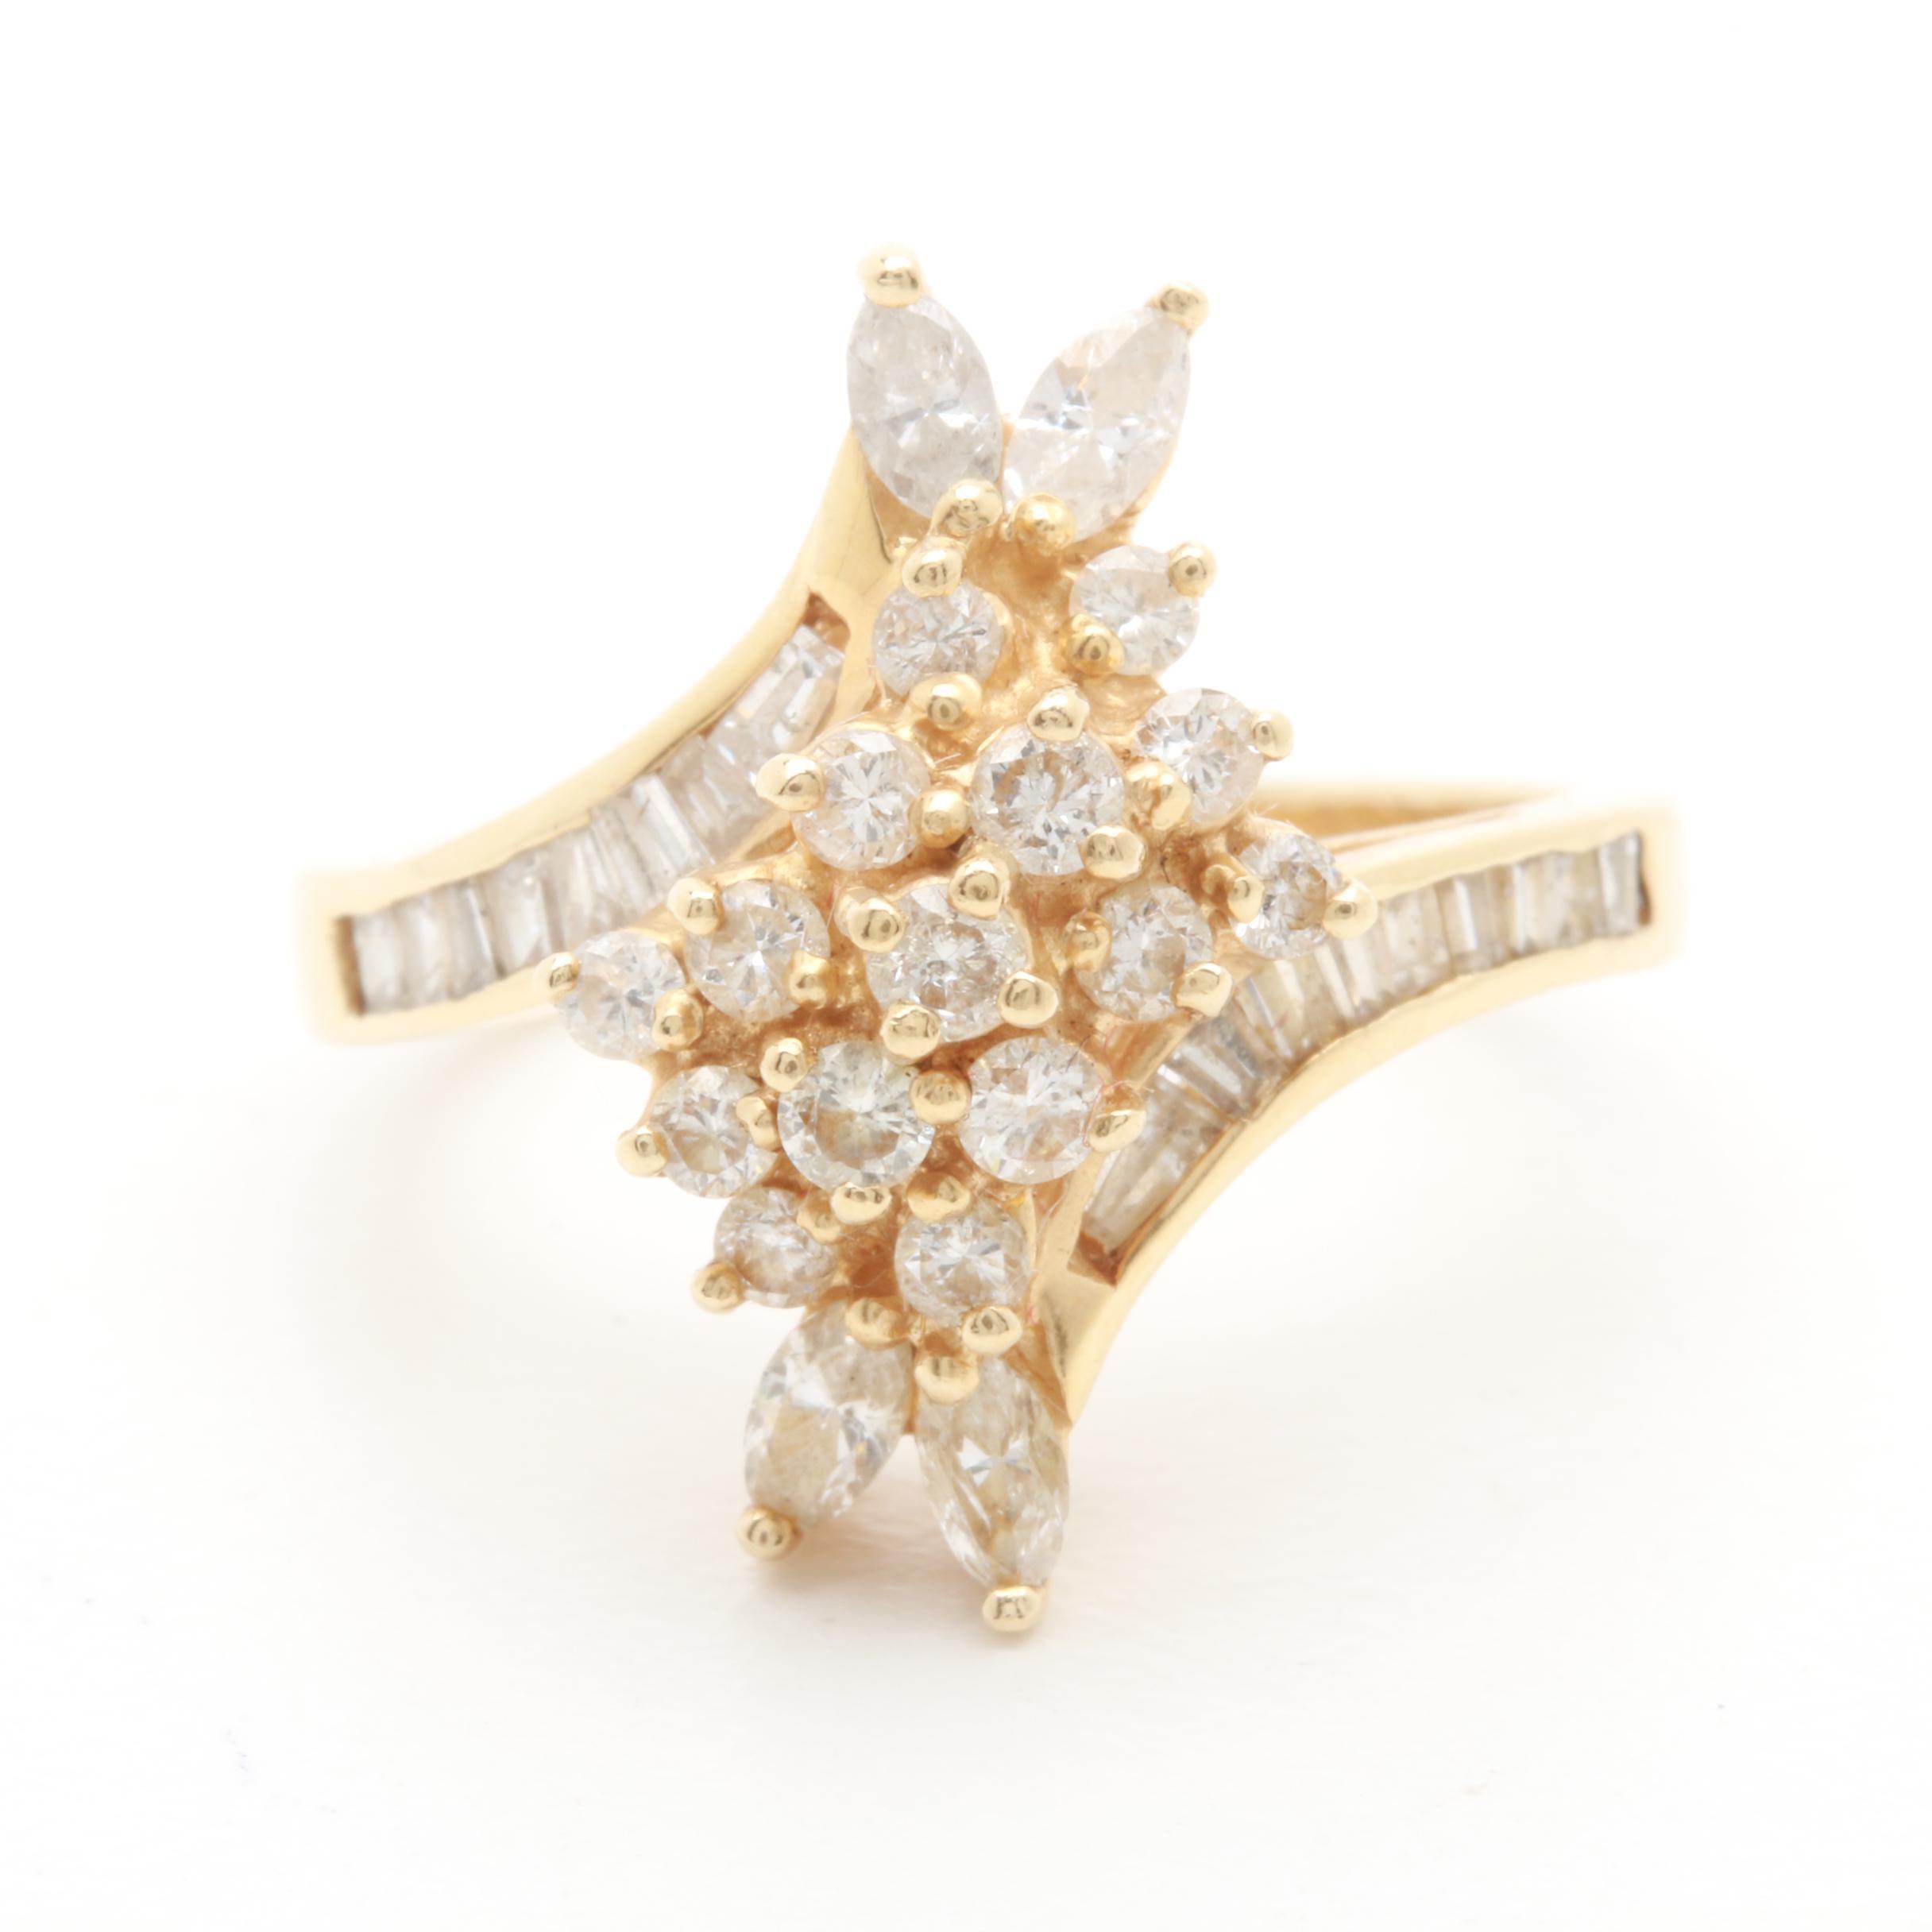 14K Yellow Gold 1.06 CTW Diamond Bypass Ring